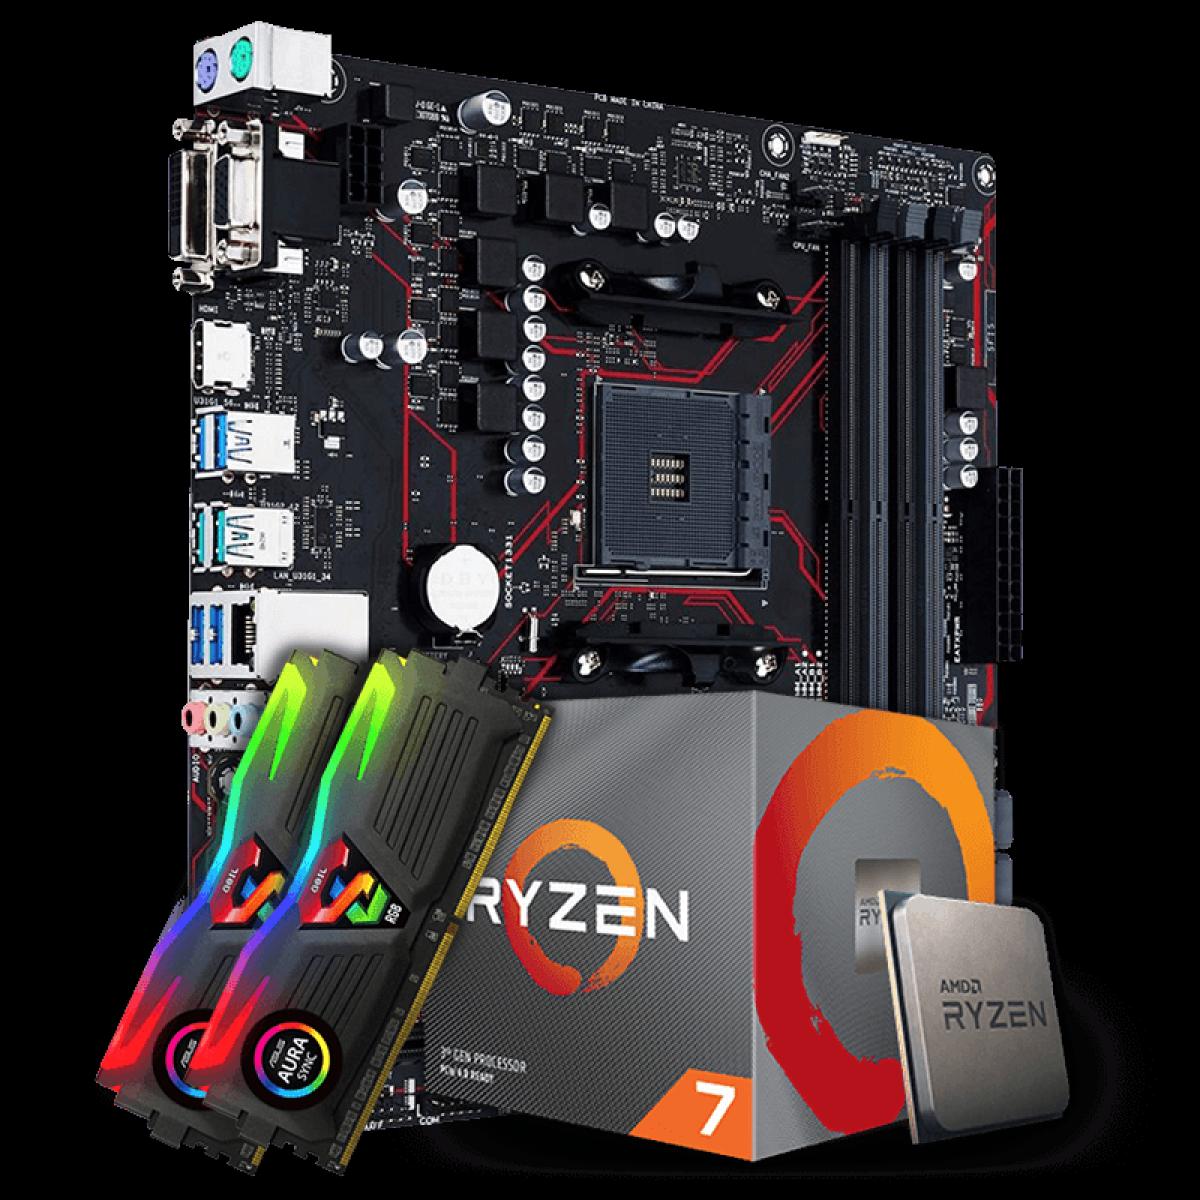 Kit Upgrade Placa Mãe Asus Prime B450M Gaming/BR AMD AM4 + Processador AMD Ryzen 7 2700 3.2GHz + Memória DDR4 16GB (2X8GB) 3000MHz